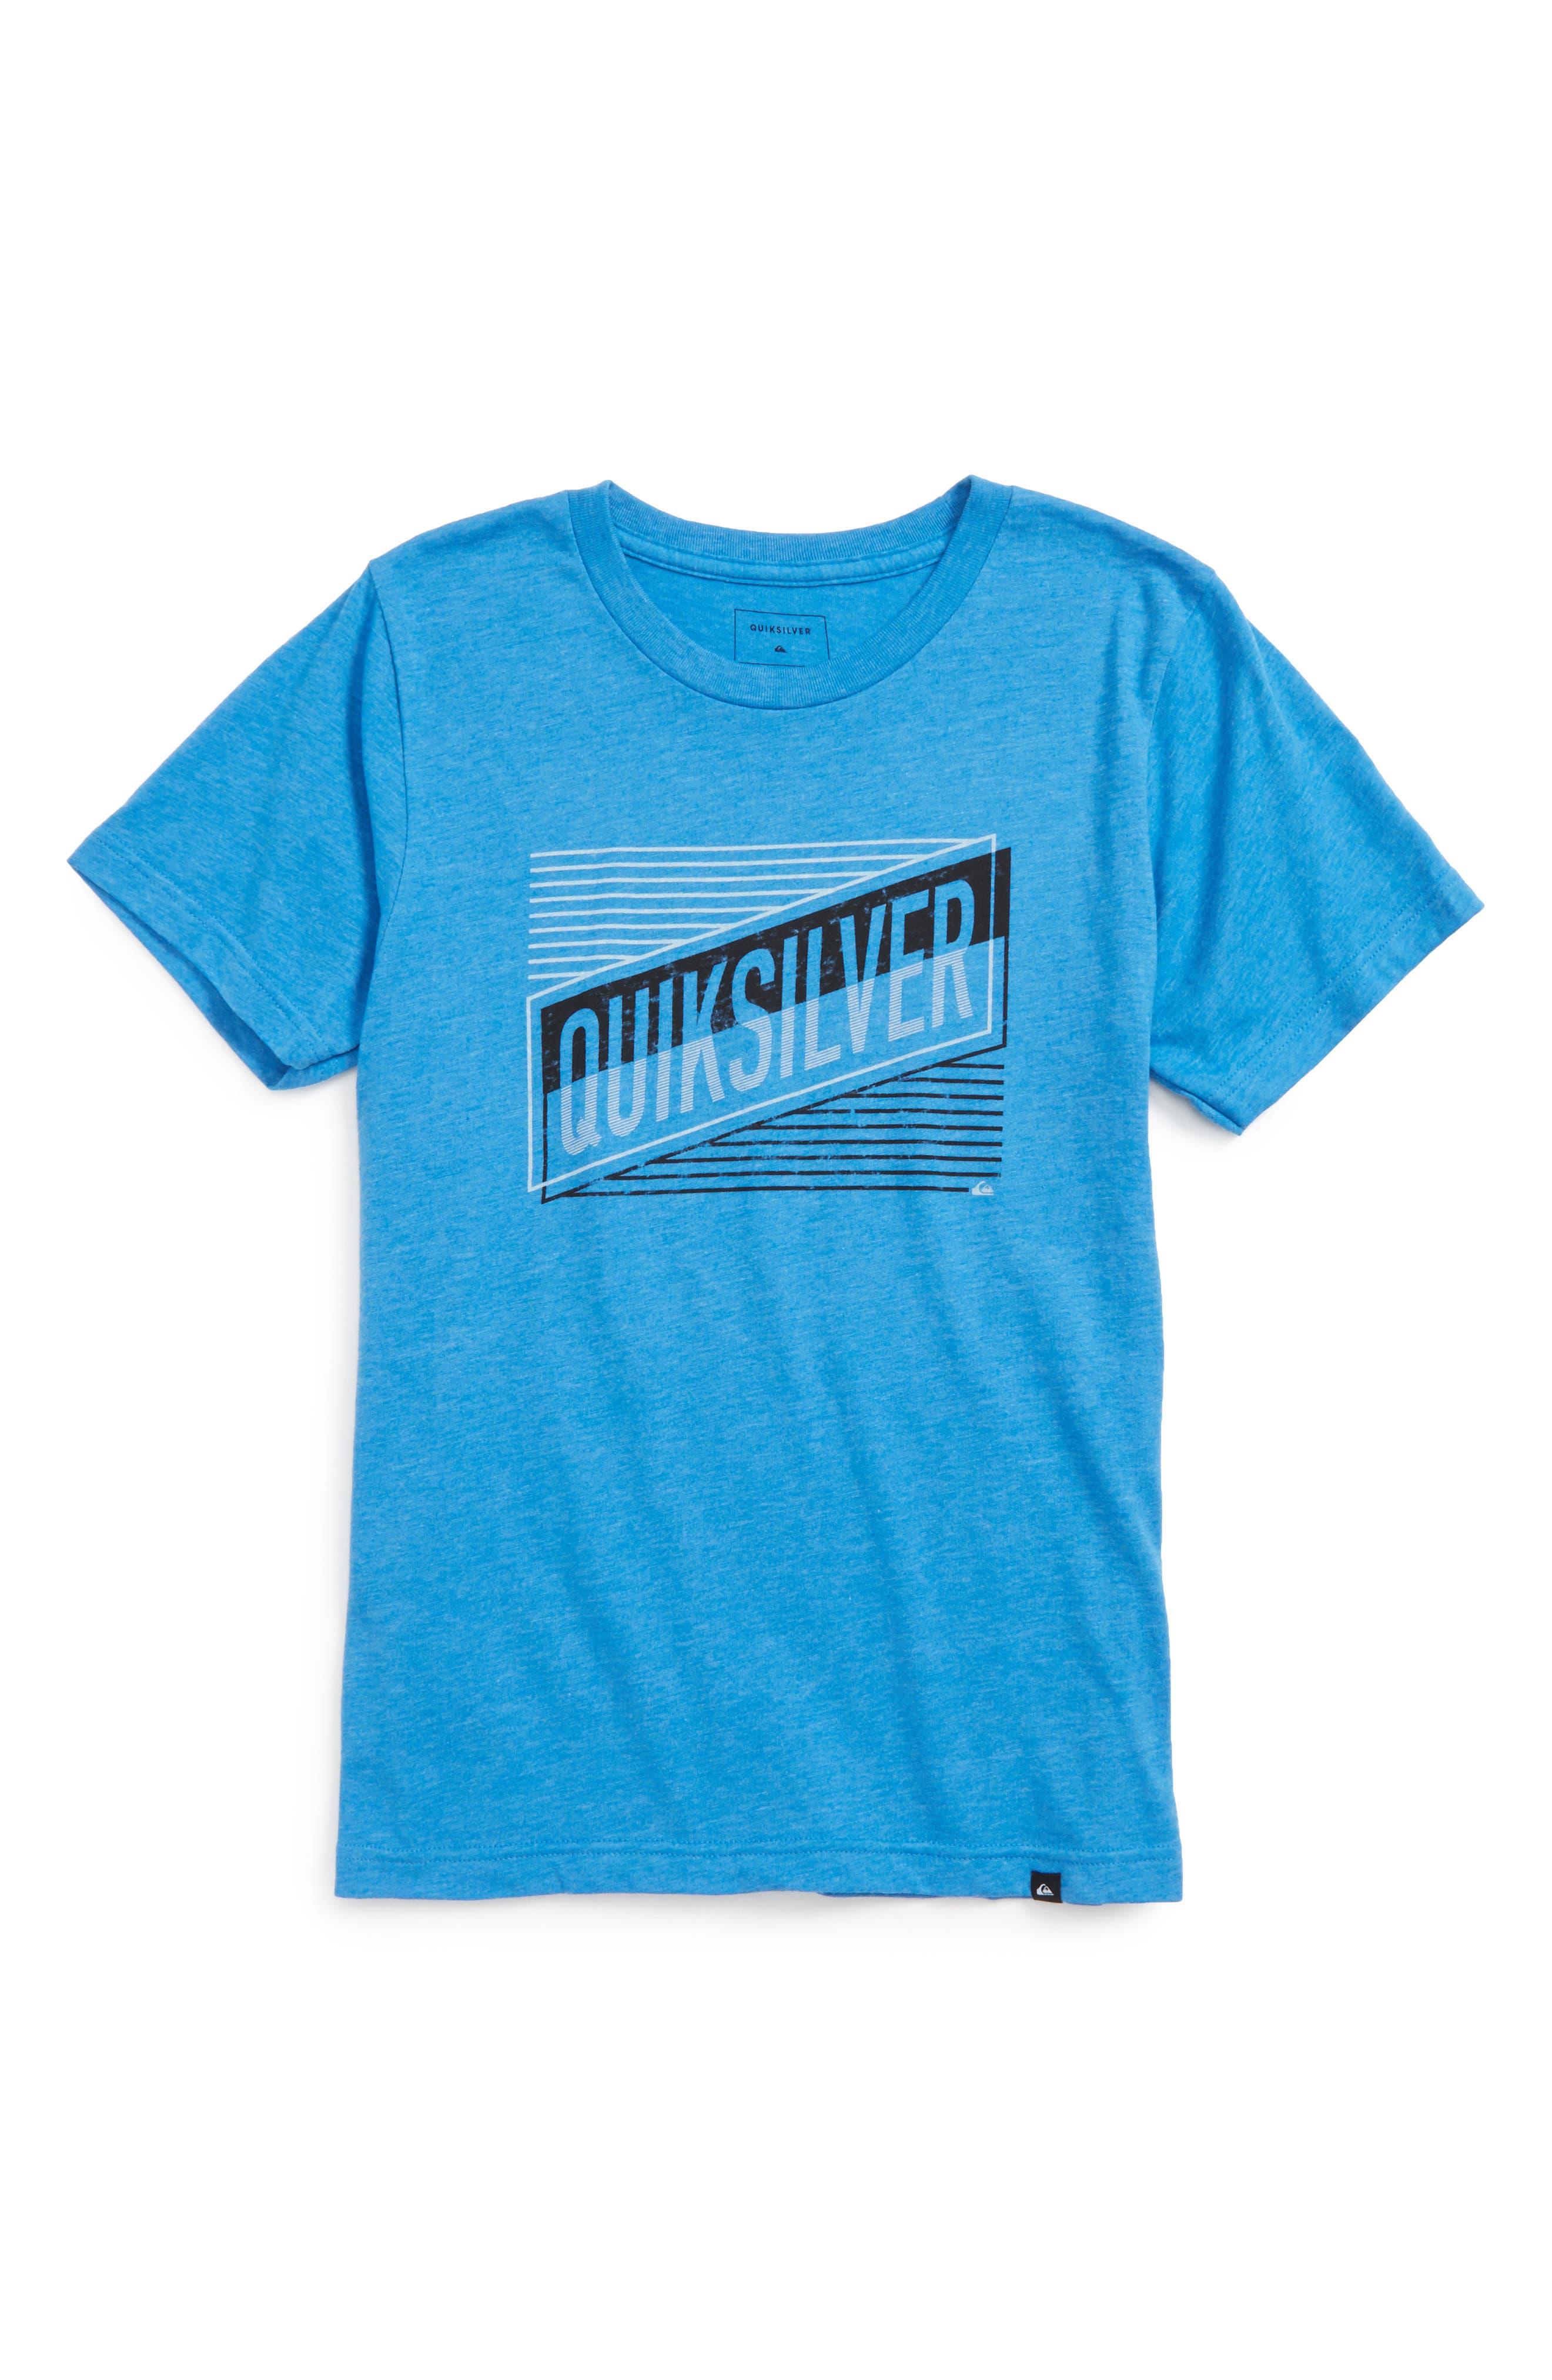 Alternate Image 1 Selected - Quiksilver Port Roca T-Shirt (Big Boys)